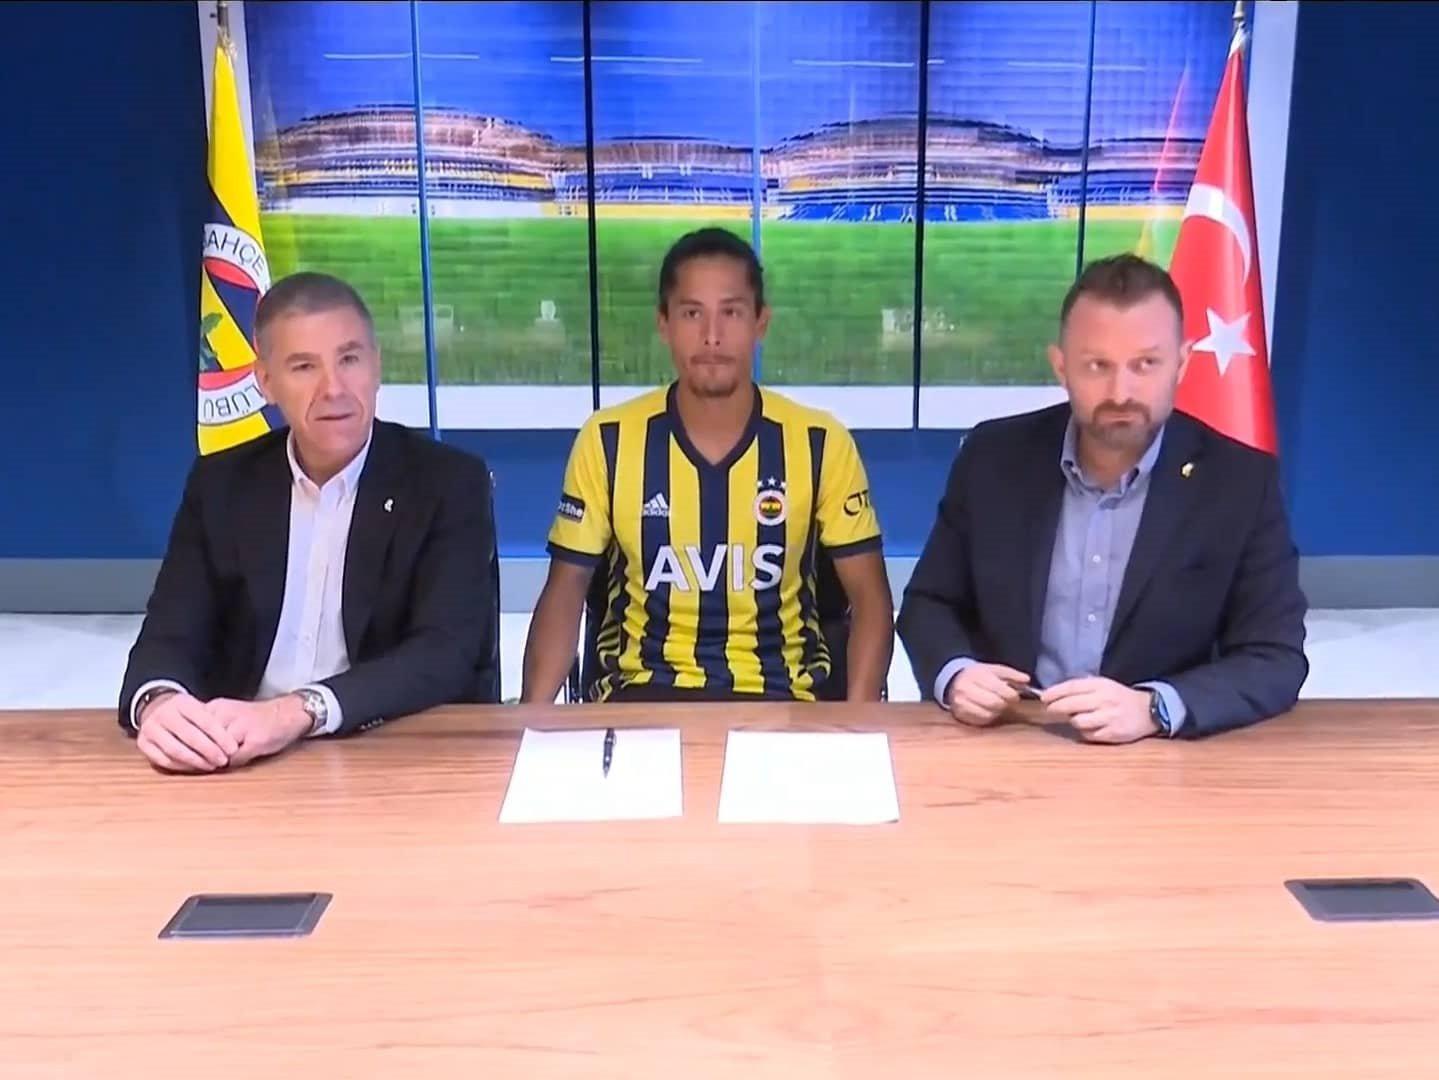 fenerbahce lemos transferini acikladi 1598440147200 - Fenerbahçe Lemos transferini açıkladı!